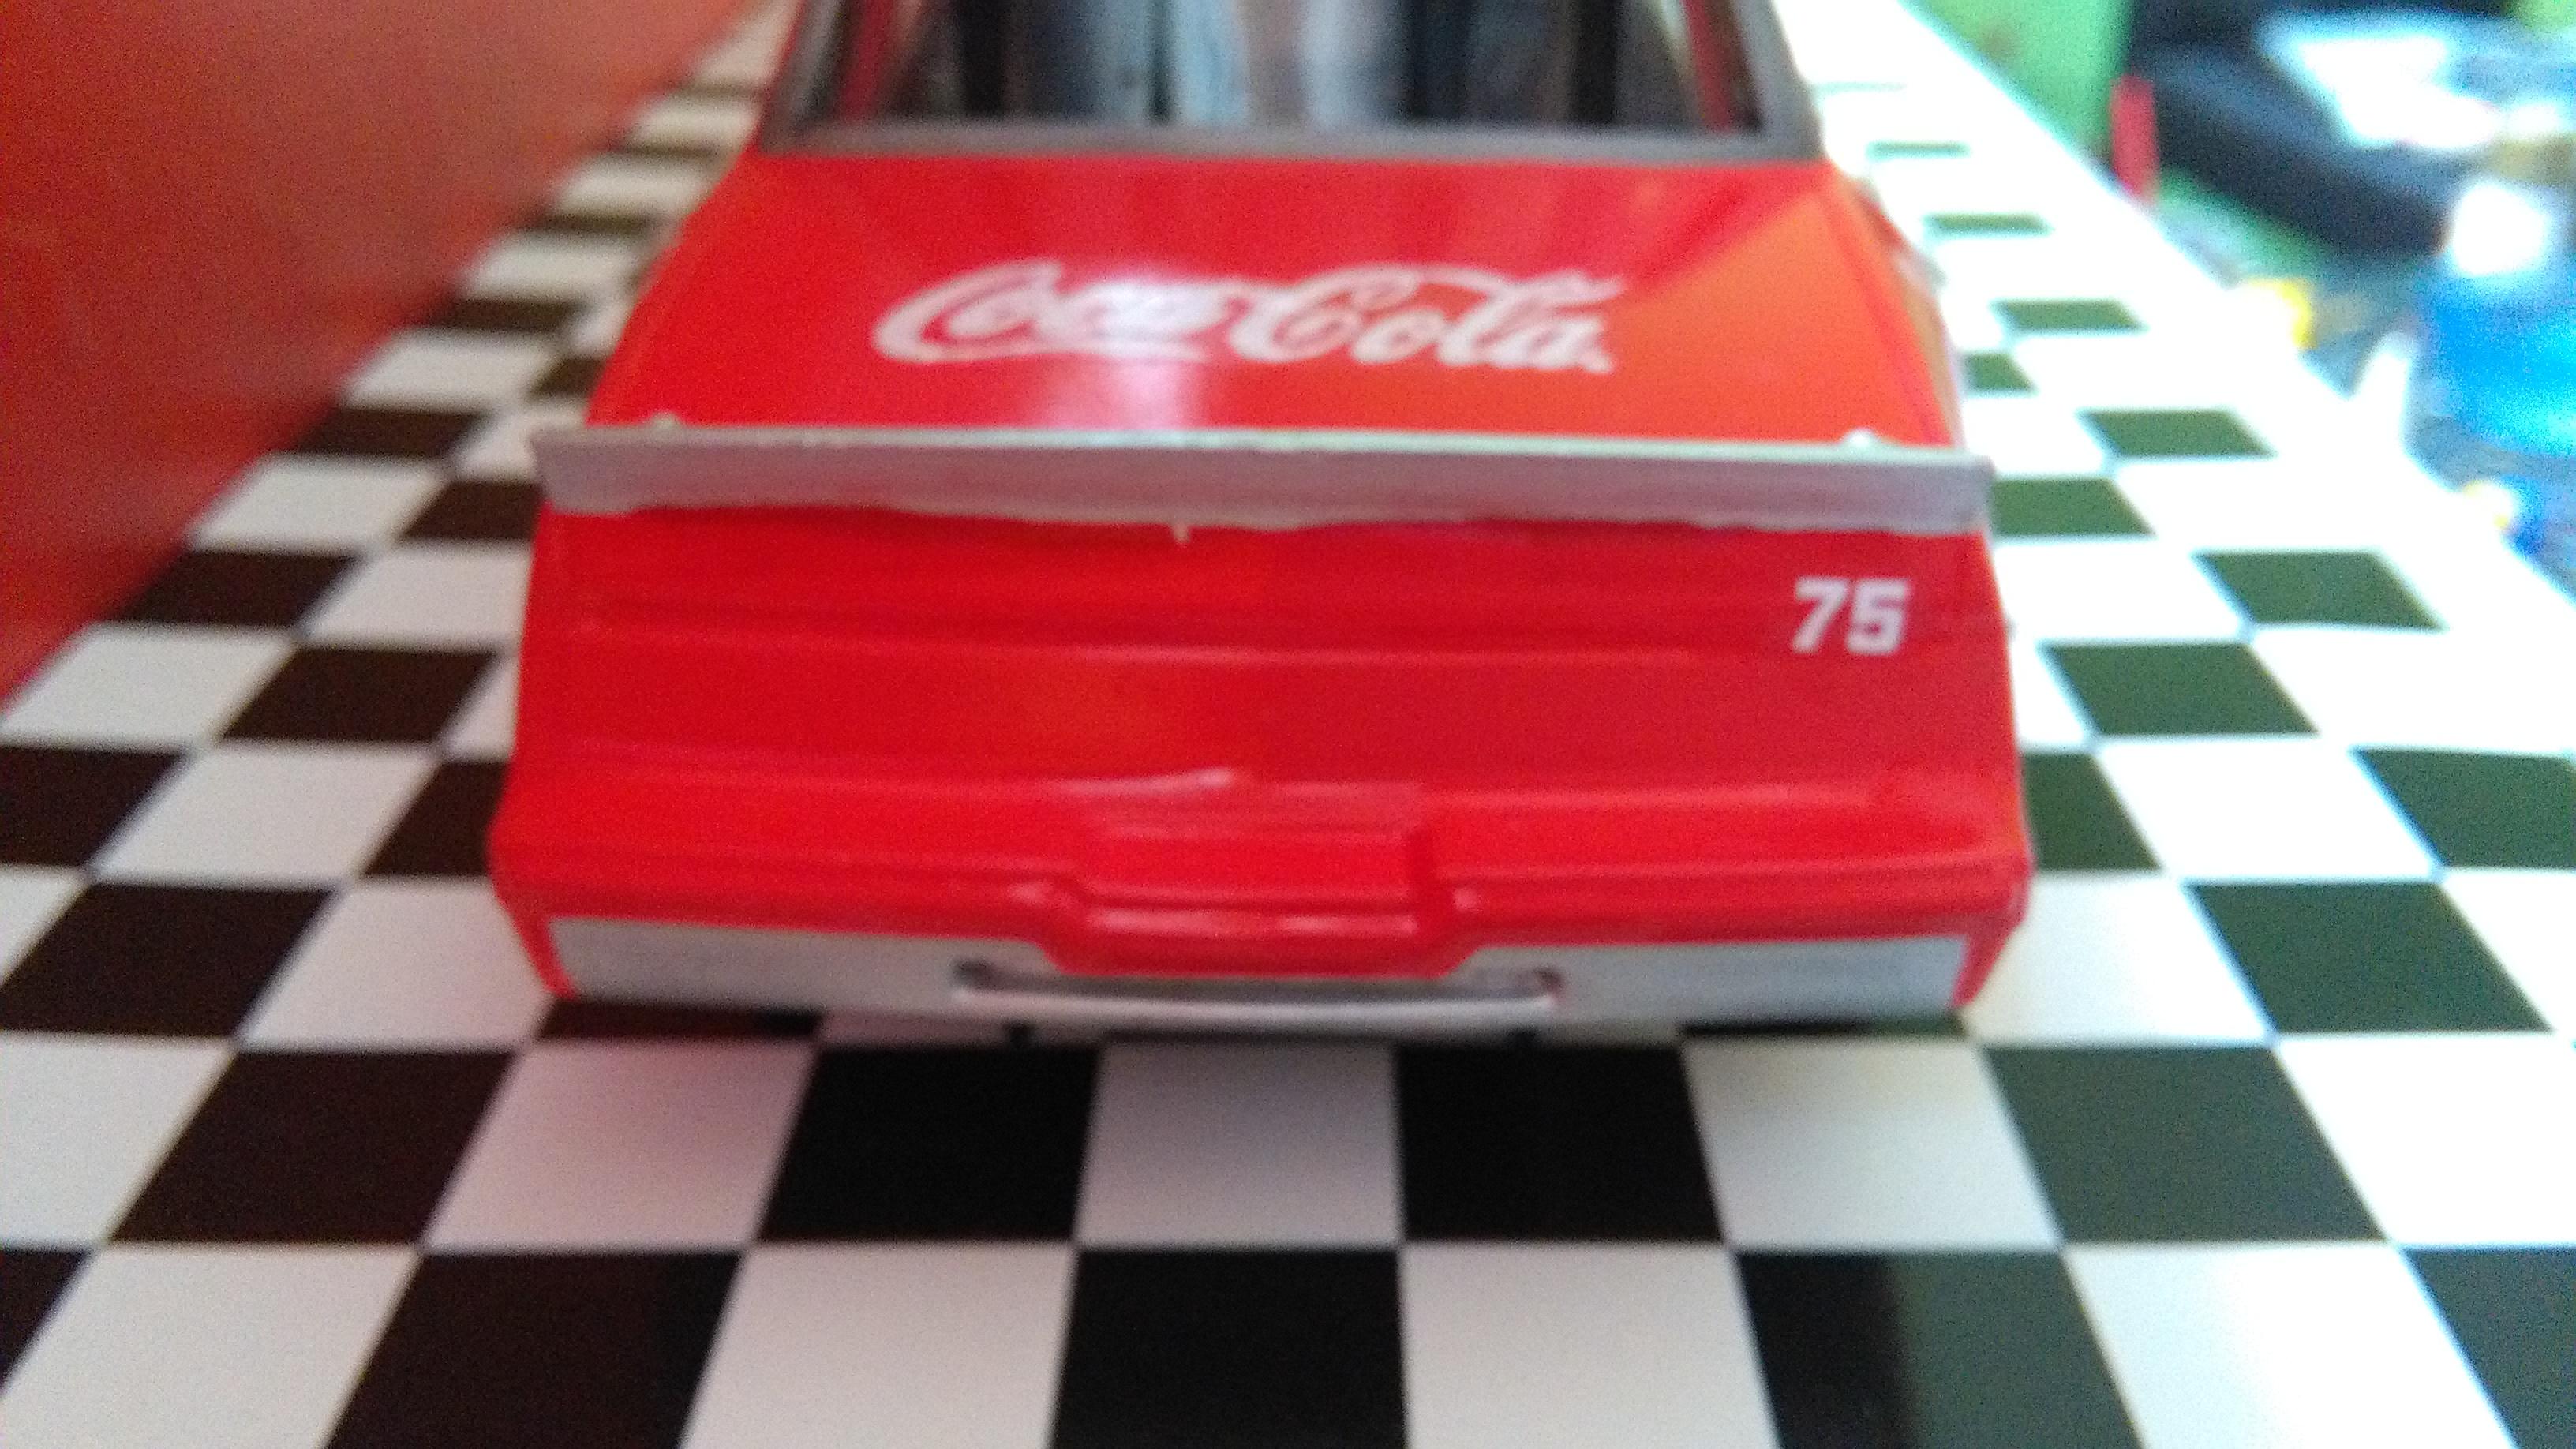 Pontiac Grand-Prix 1985 #75 Dave Marcis Coca-Cola (AMT 1/25) 615639IMG20170506154215